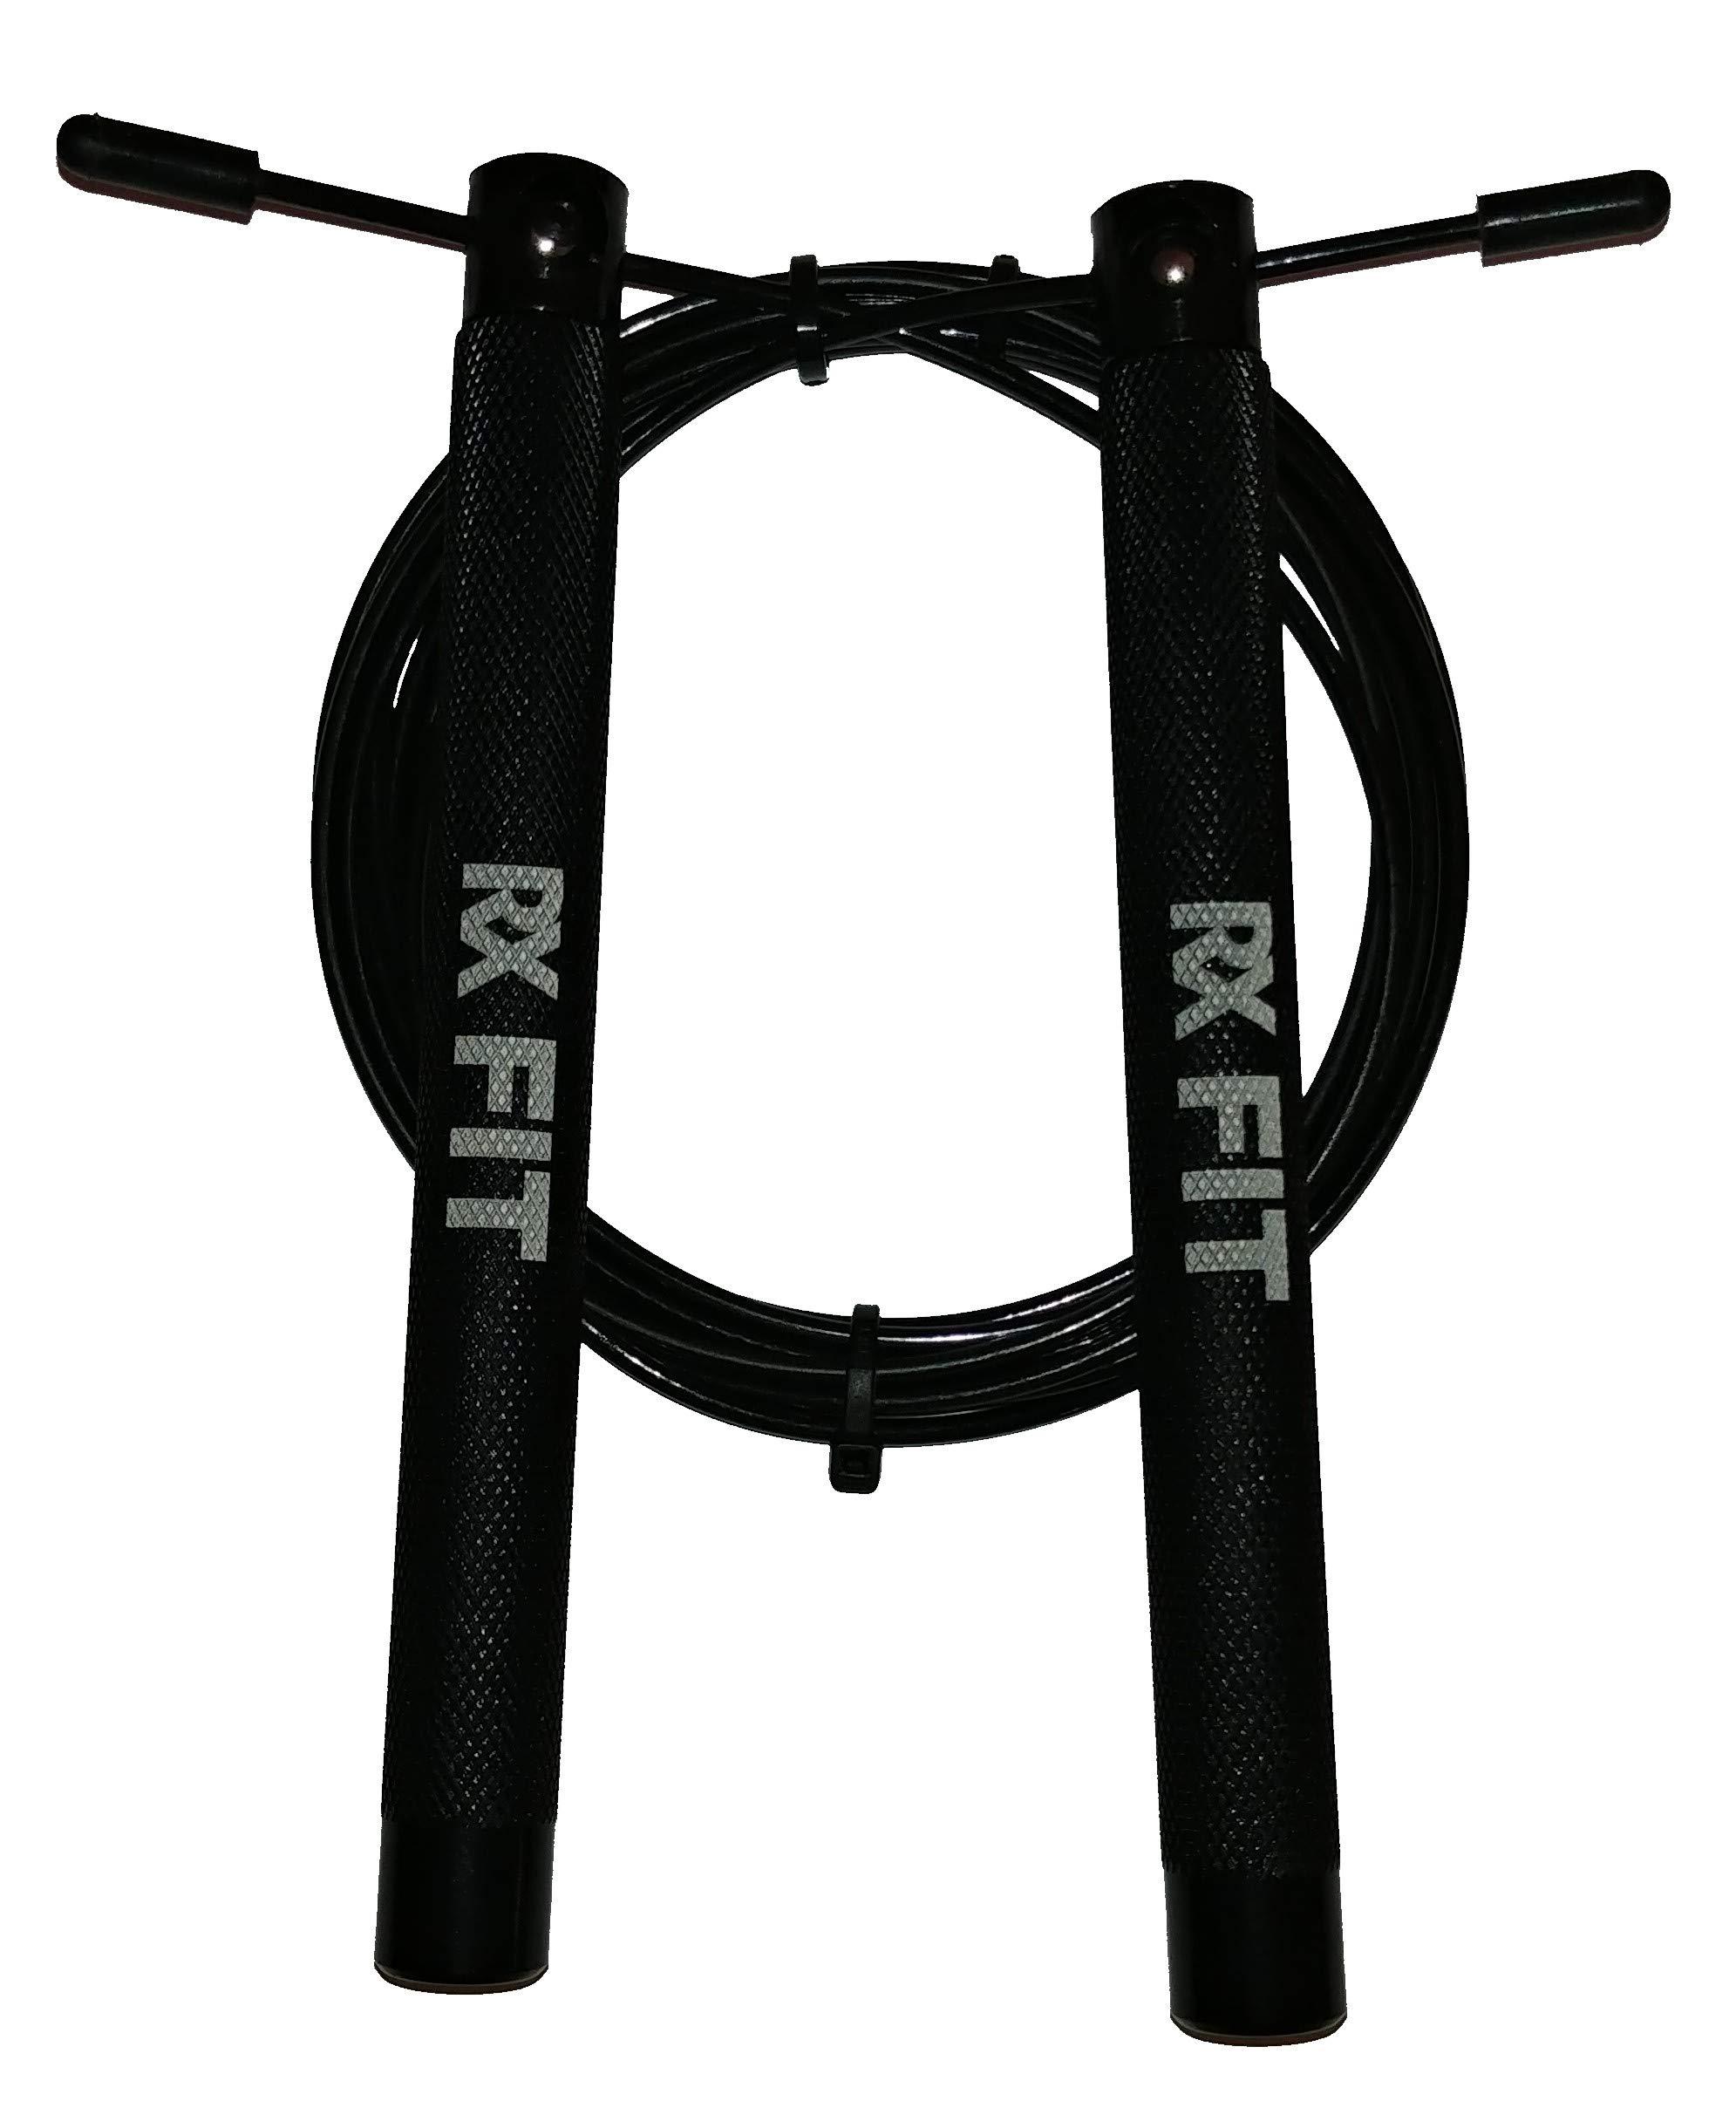 RxFIT Light Aluminum Handled Crossfit Jump Rope (Black)